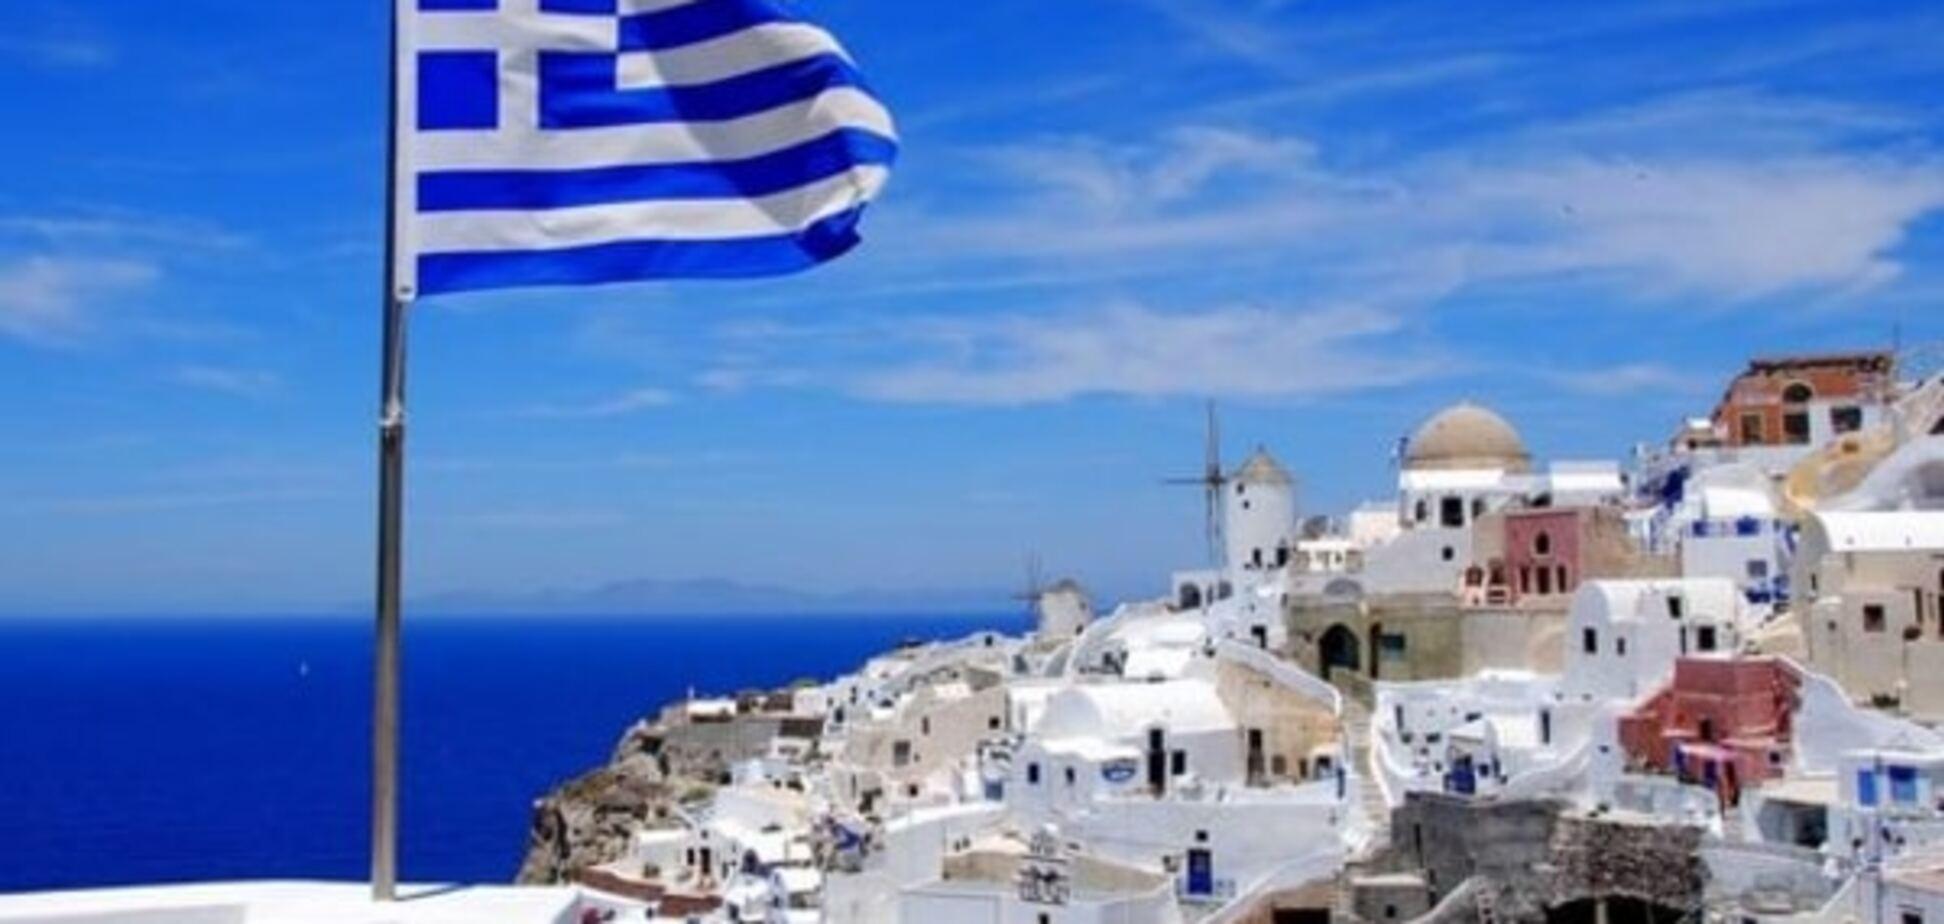 Еврокомиссия одобрила программу спасения Греции на 86 млрд евро